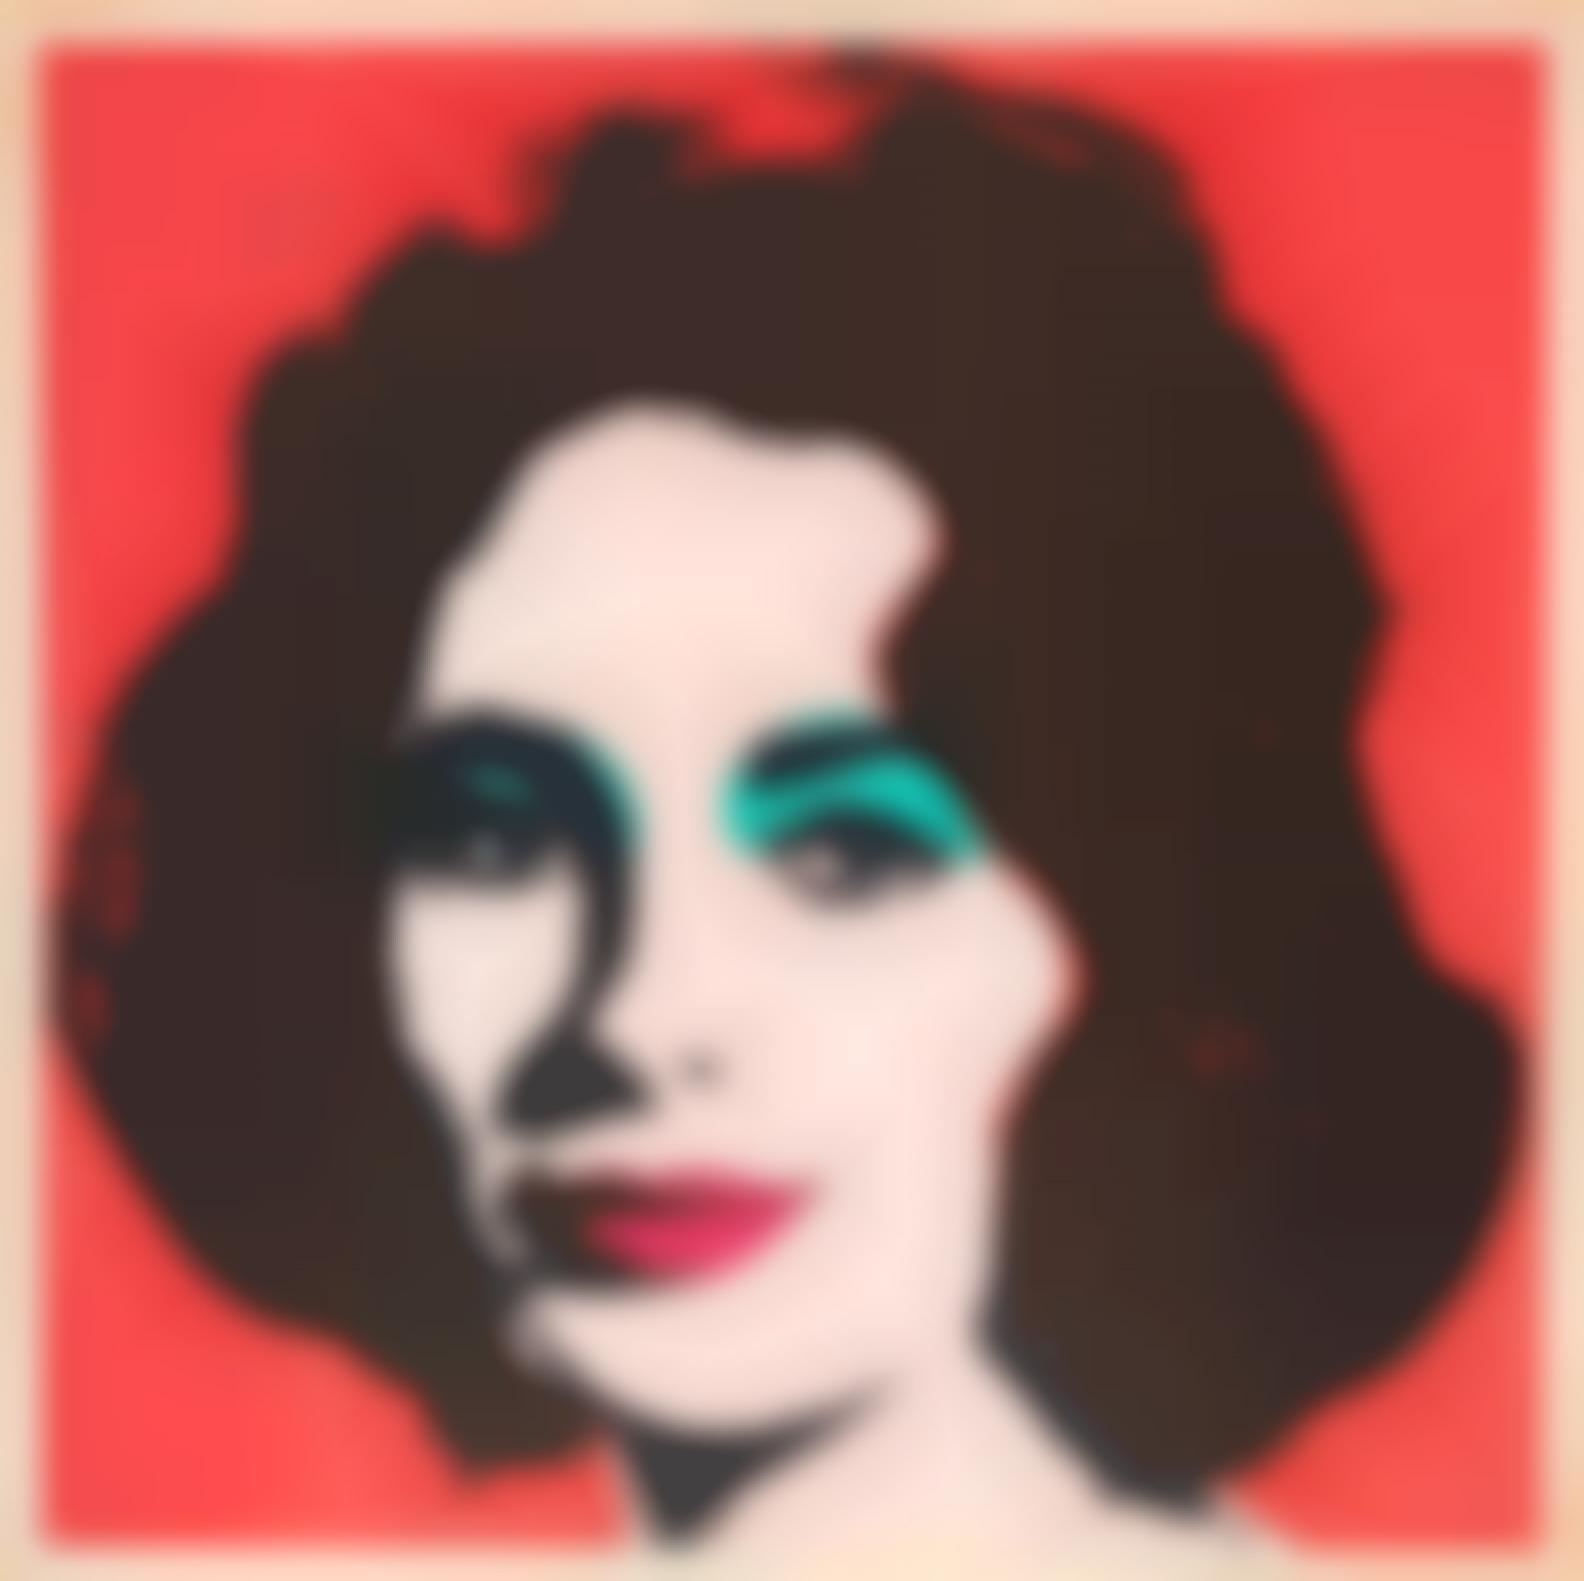 Andy Warhol-Liz (Feldman & Schellmann II.7)-1964